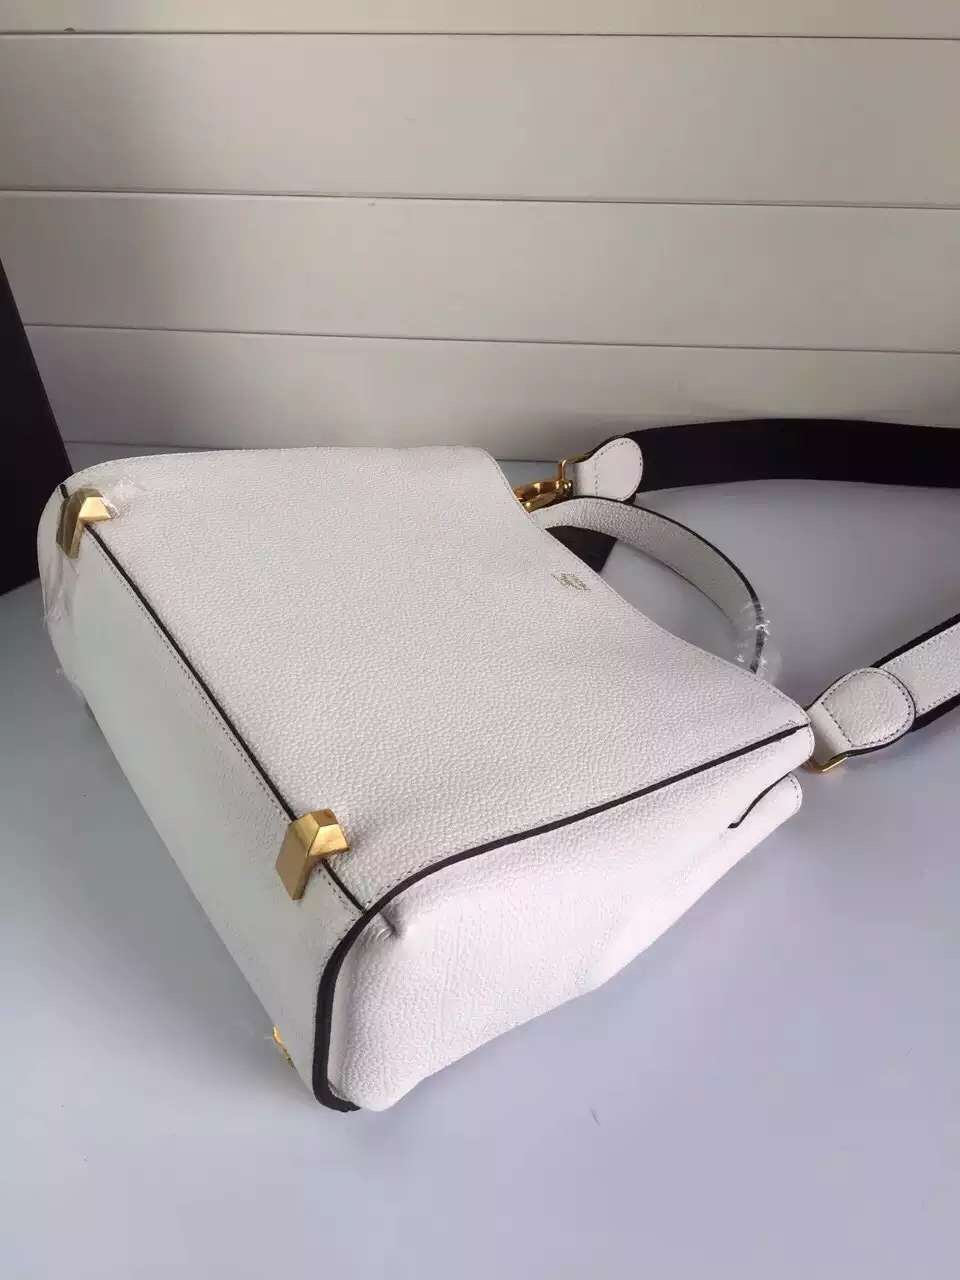 MCM官网 韩国进口牛皮搭配纯棉里布 原单包包批发 一件代发